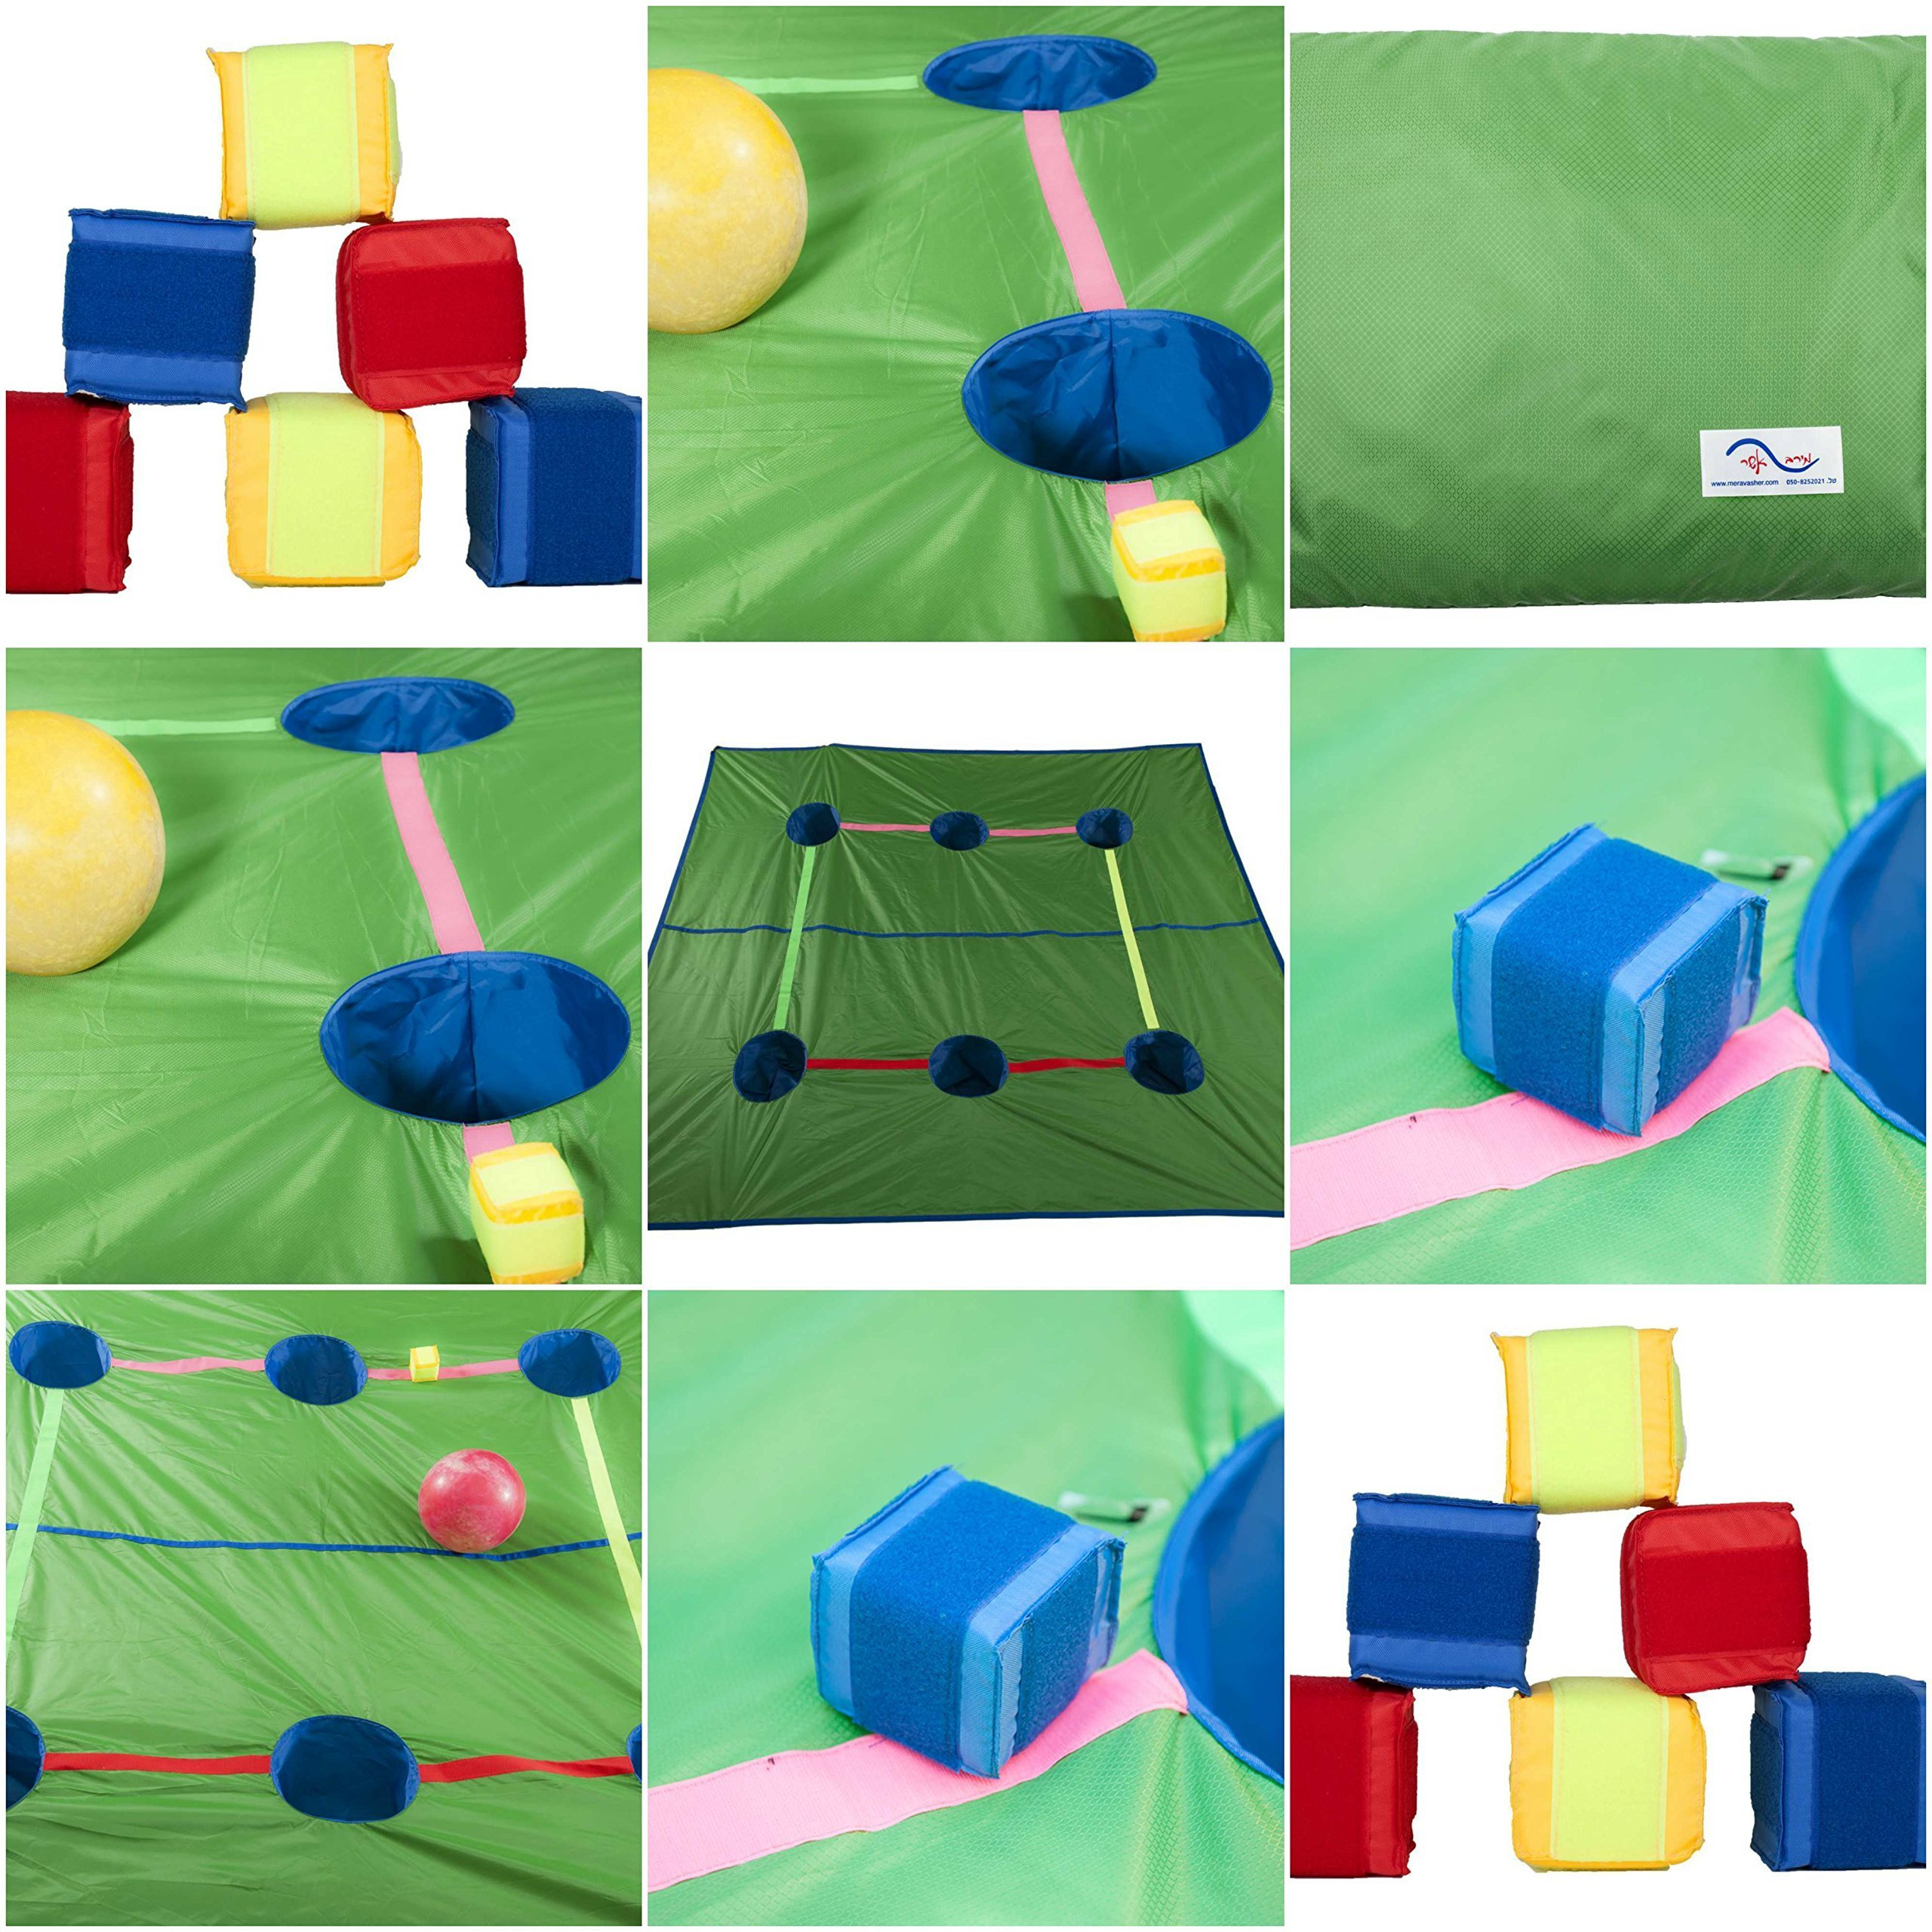 Merav Asher's Cooperative multitask baskets Tarp Parachute + 4 hook and loop compatible cubes, School sports equipment, preschool educational game